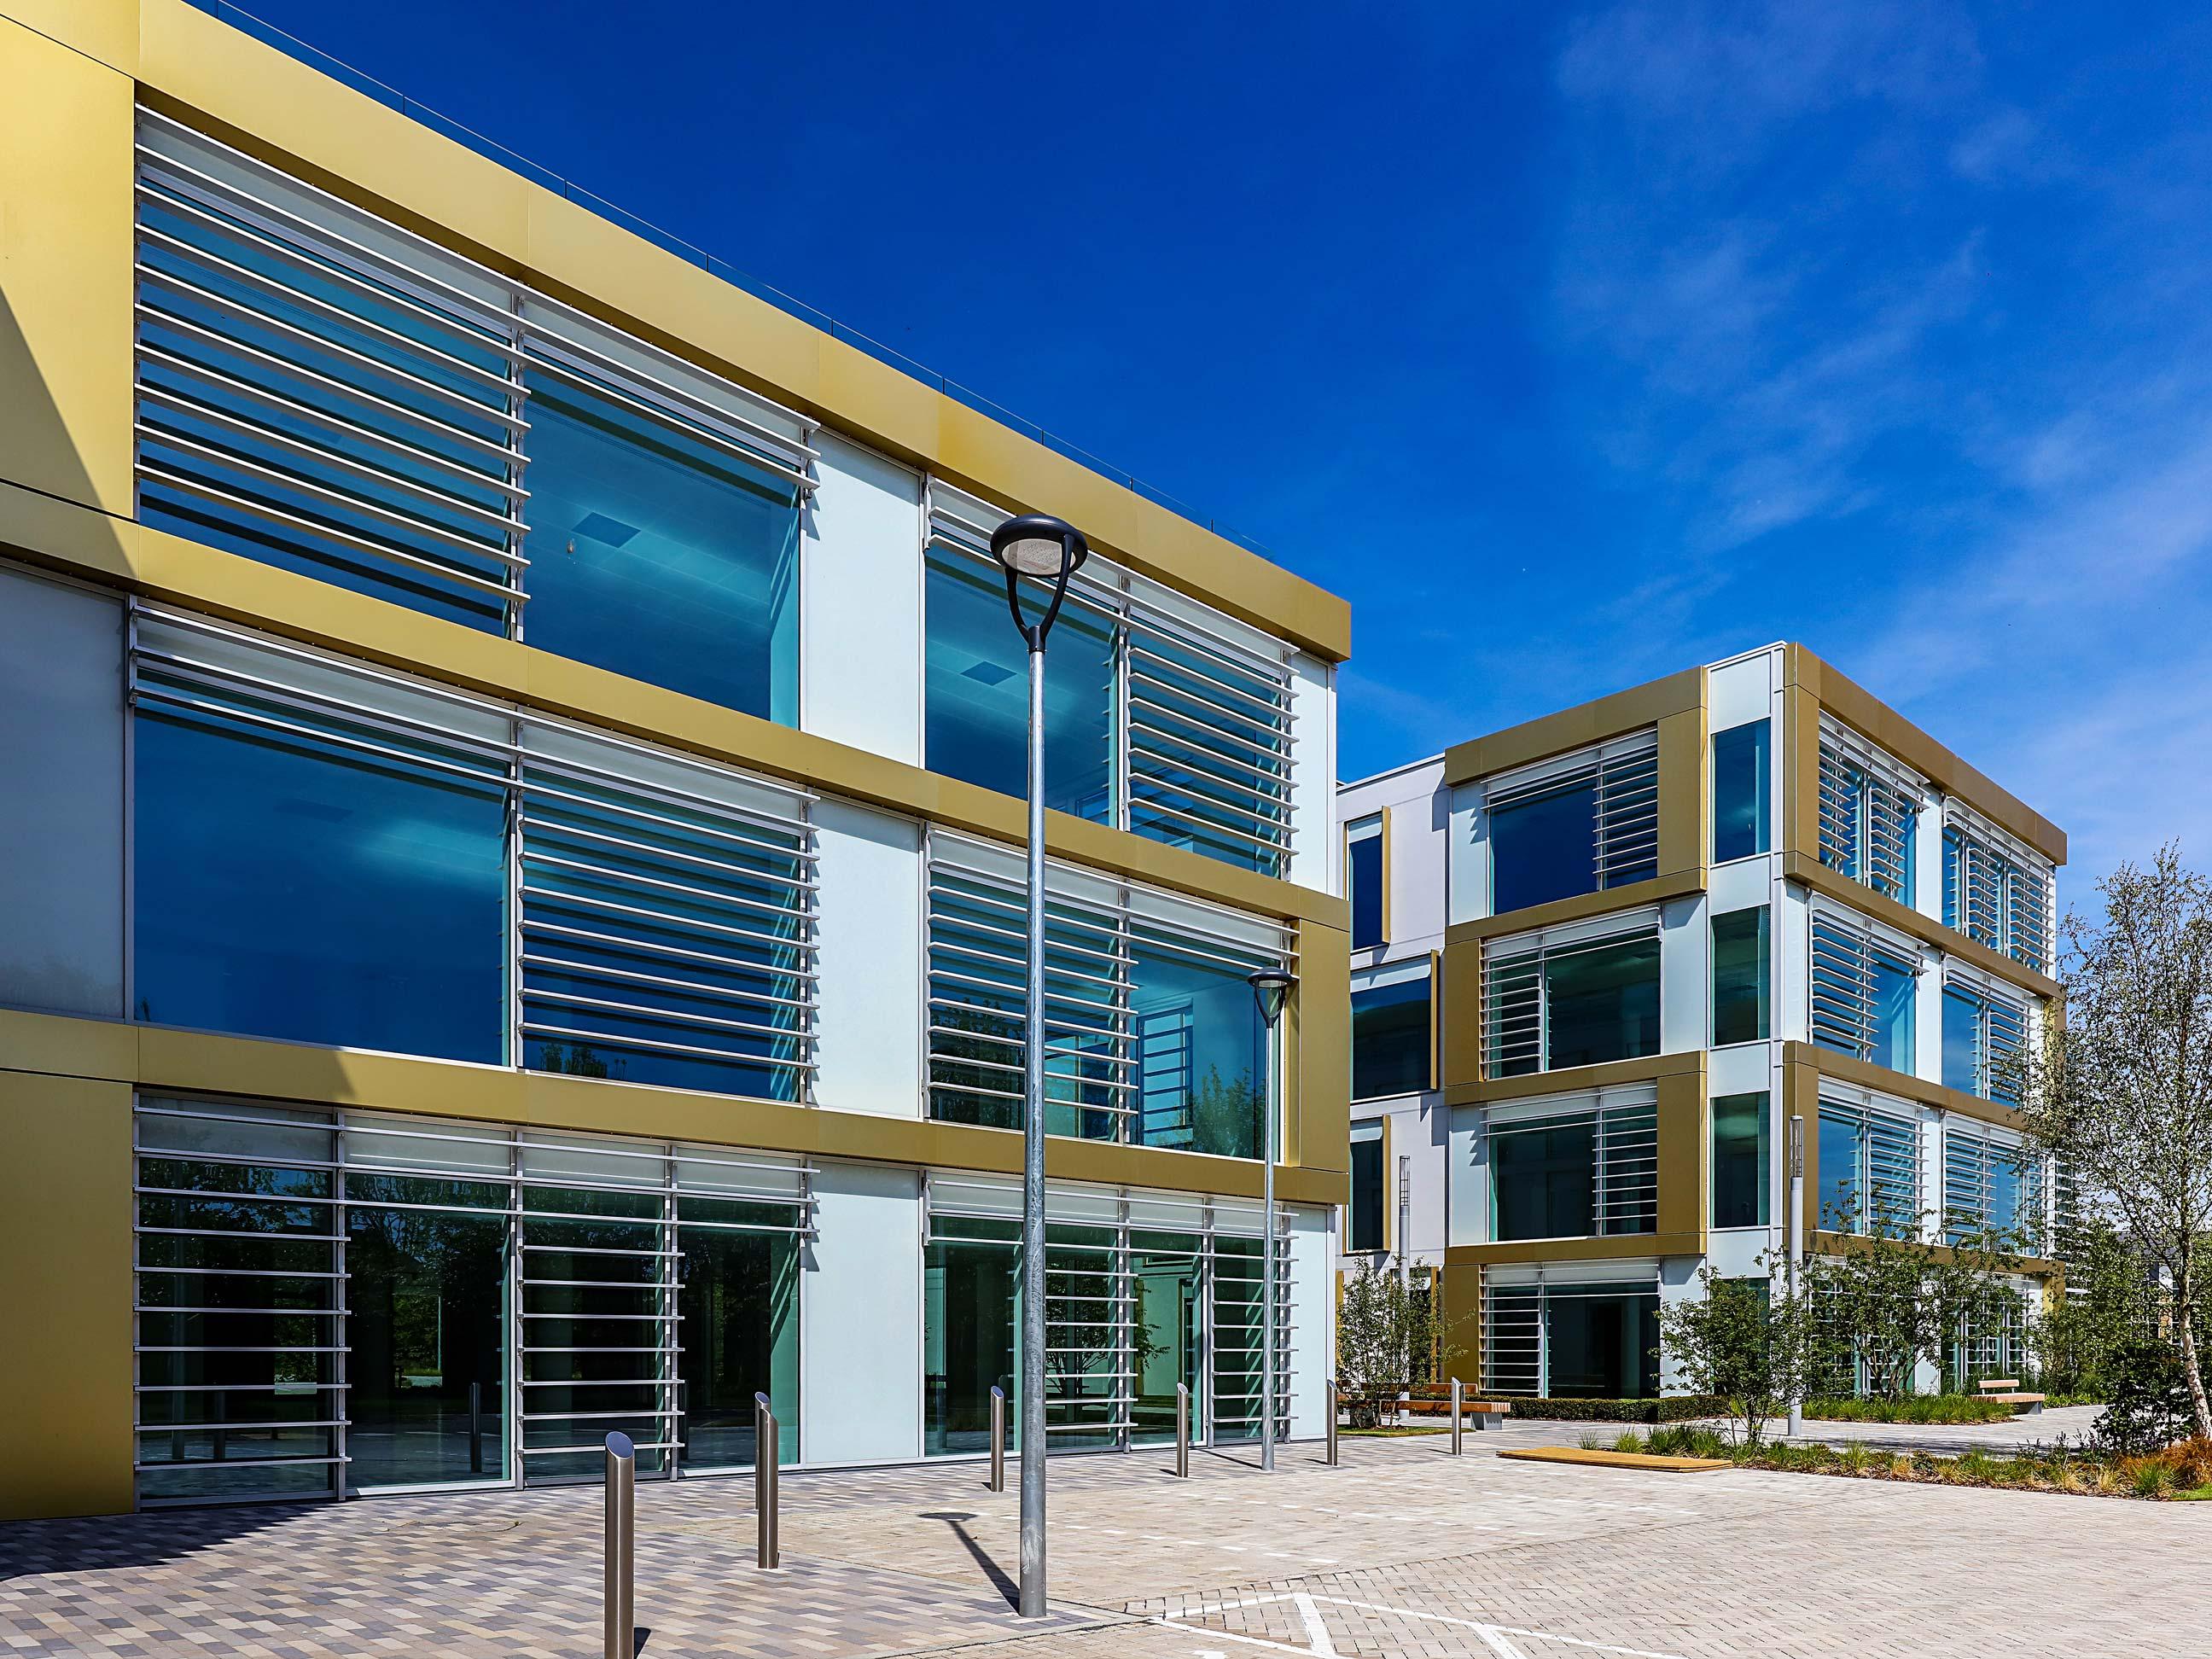 Bourne Business Park 2